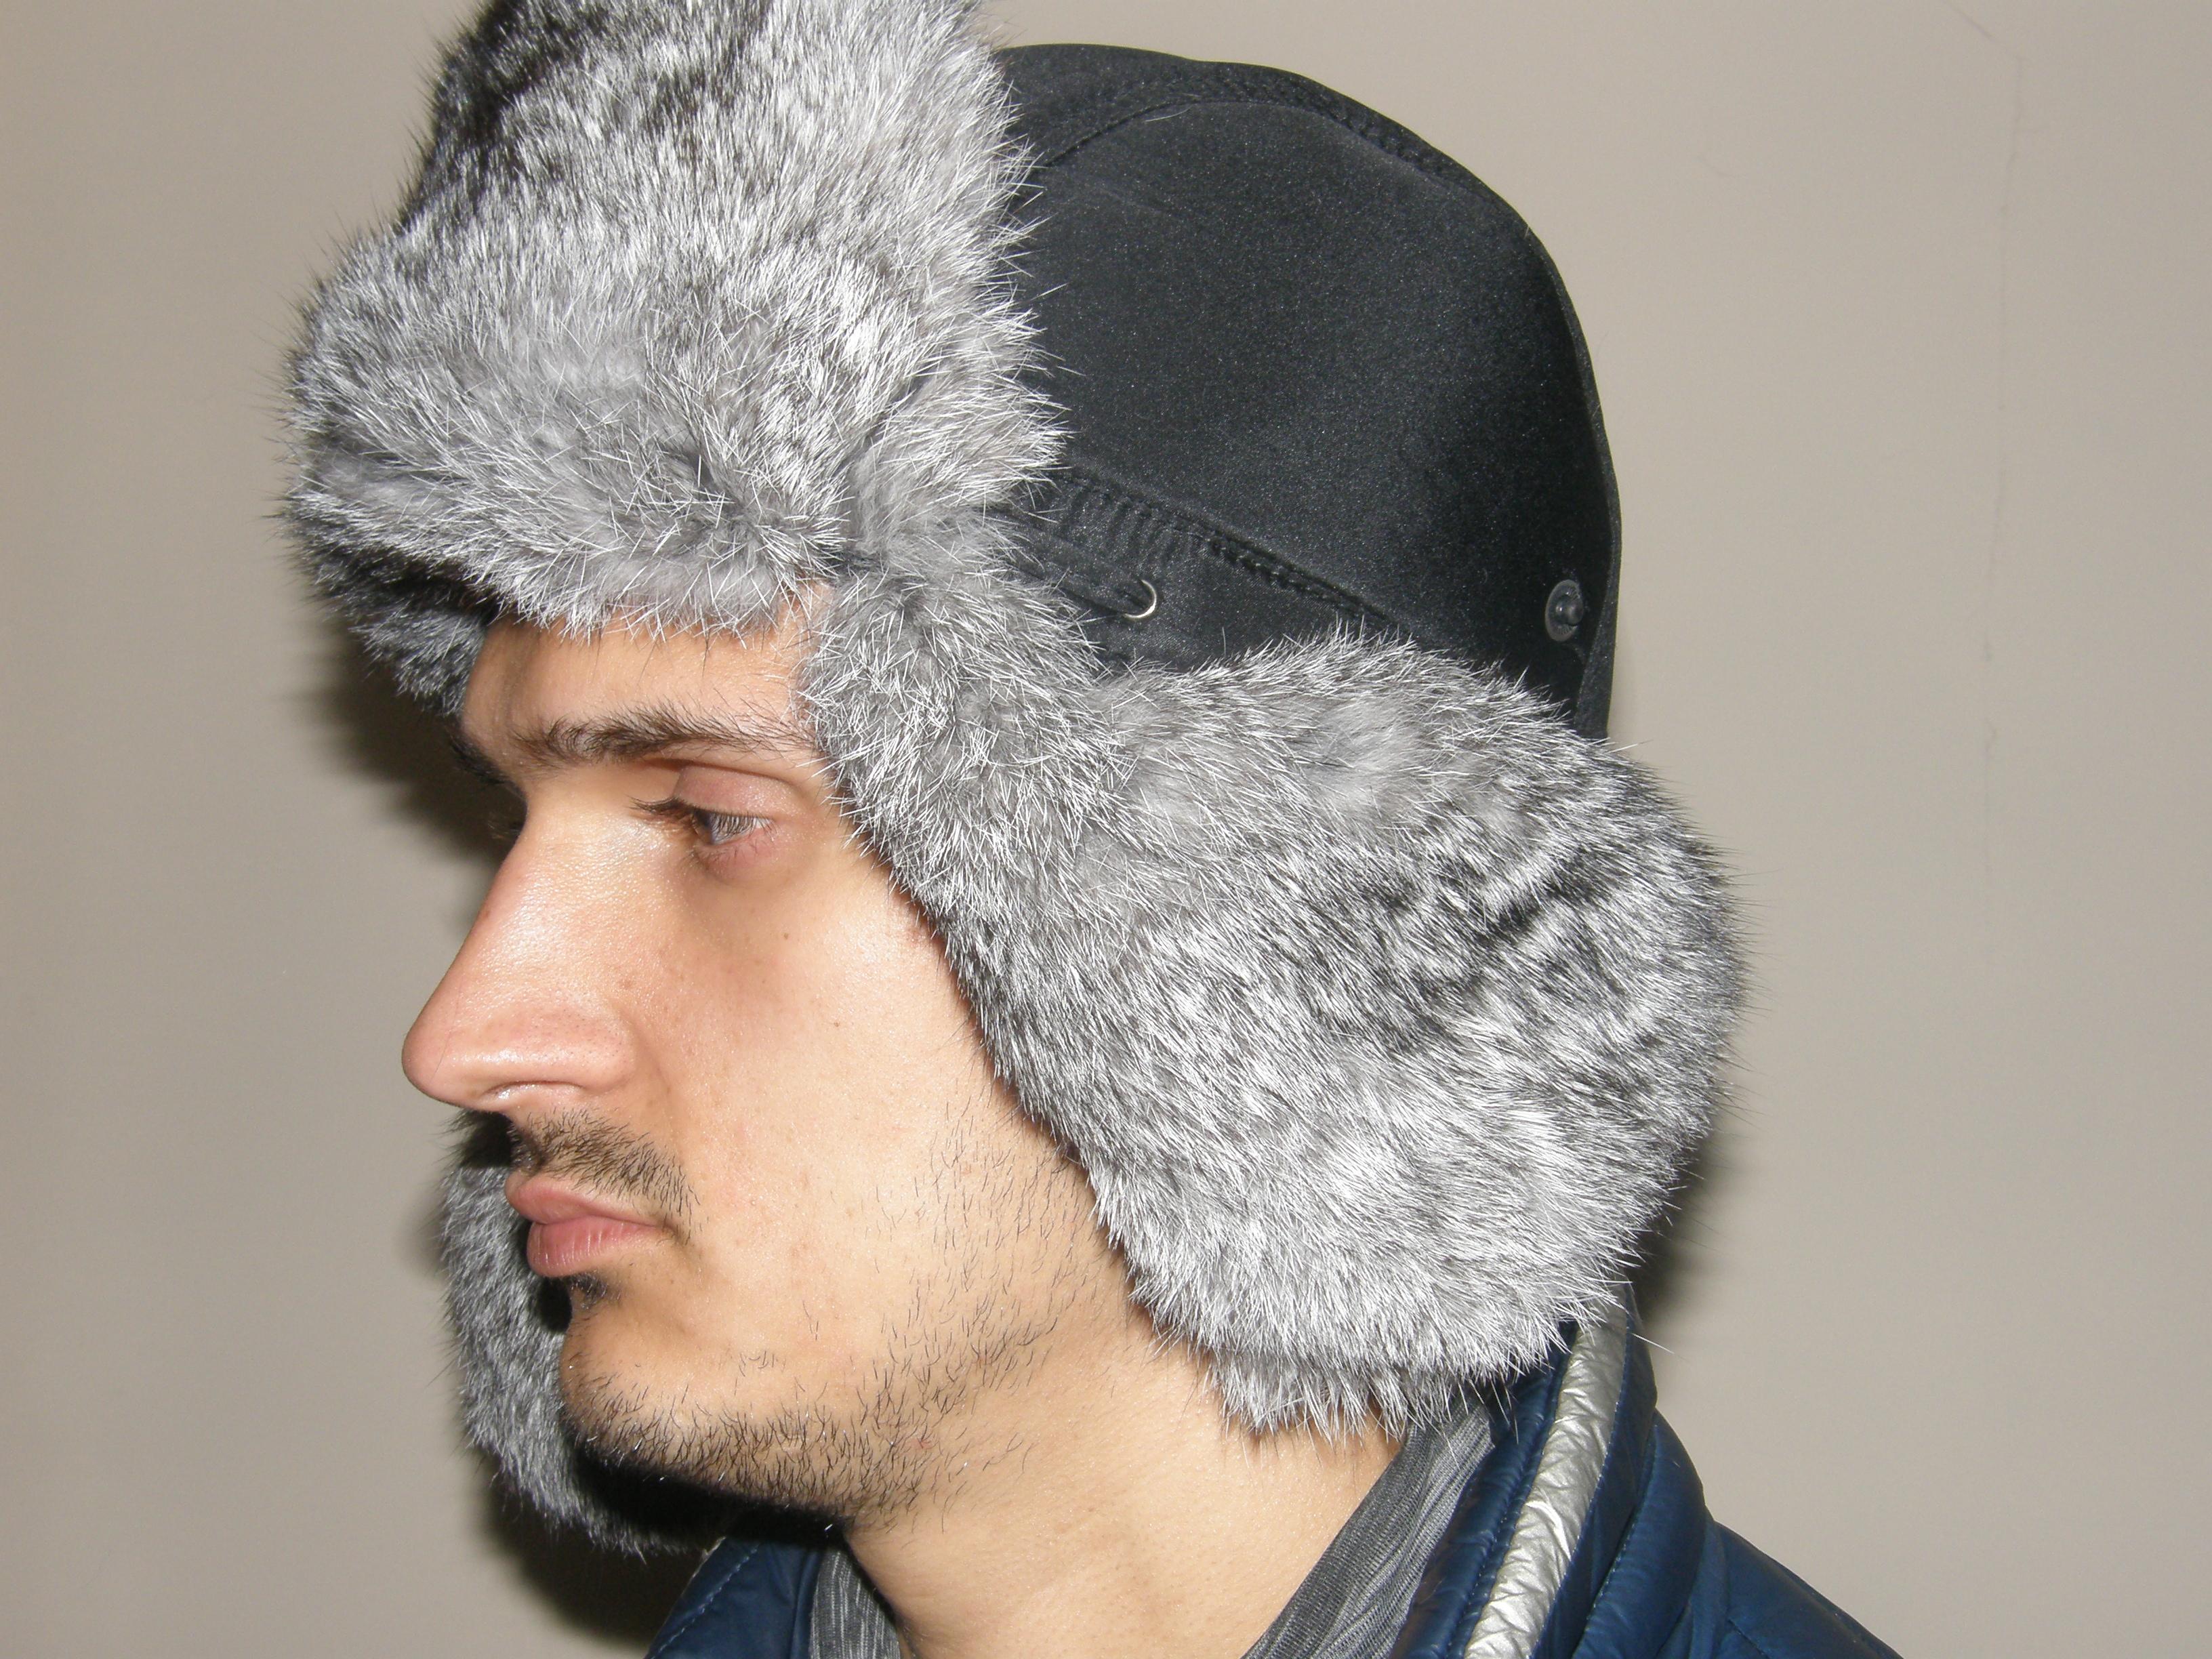 Мужские шапки из кролика оптом - Фотогалерея шапок - Шапки з ... bc5c53215dbaf